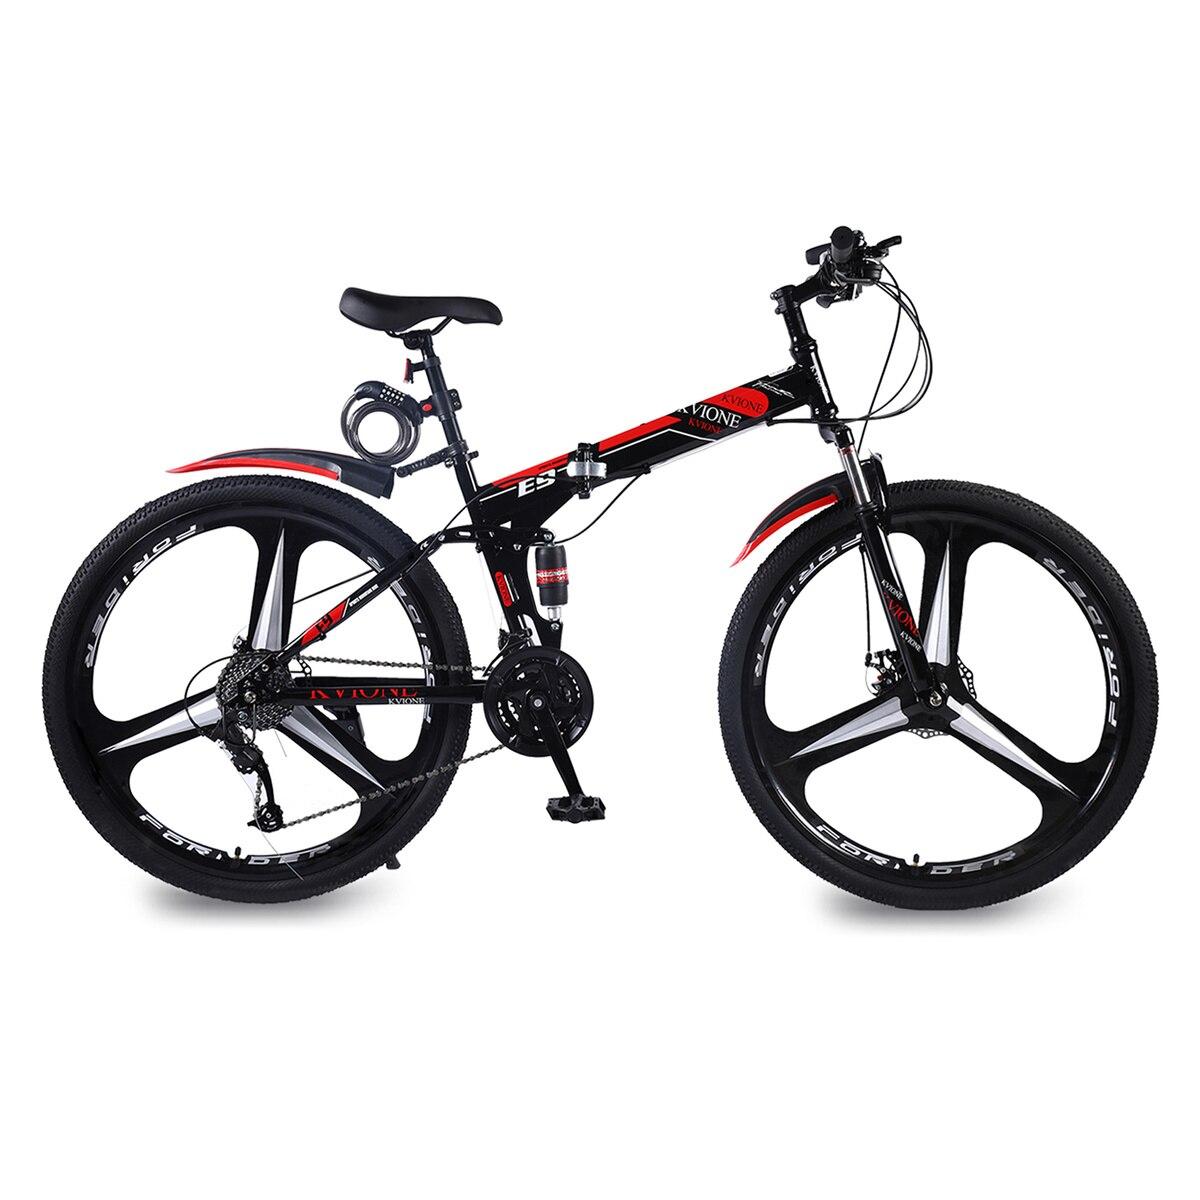 KVIONE E9 29 Inches 27 Speed Mountain Bike For Men And Women  MTB Mountain Bicycle High-carbon Steel  Disc Brake Folding Bike